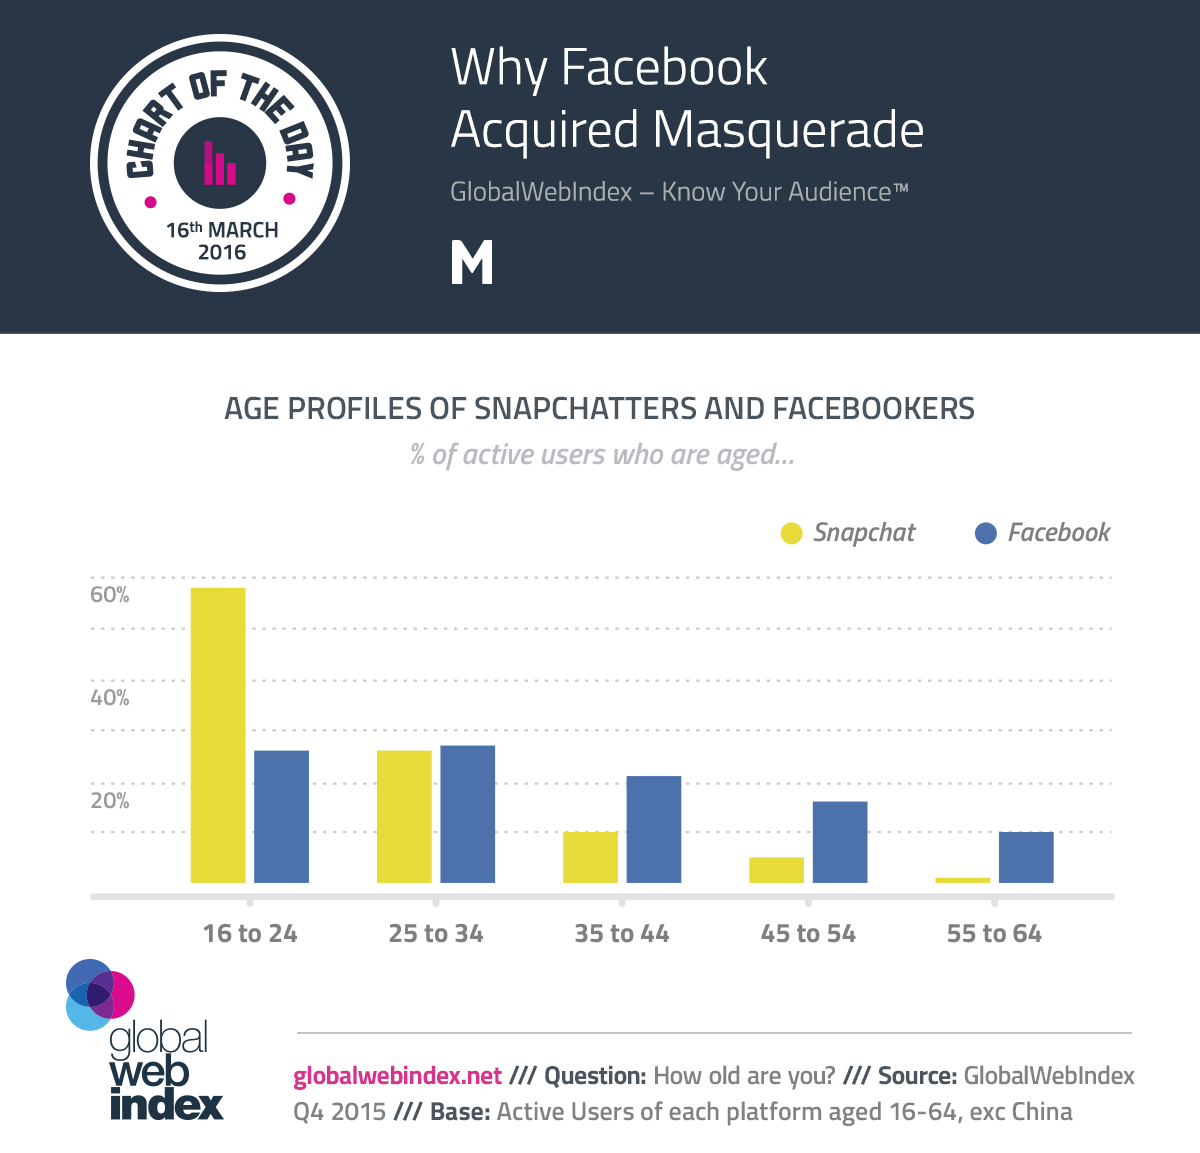 ¿Por qué Facebook Adquirida mascarada